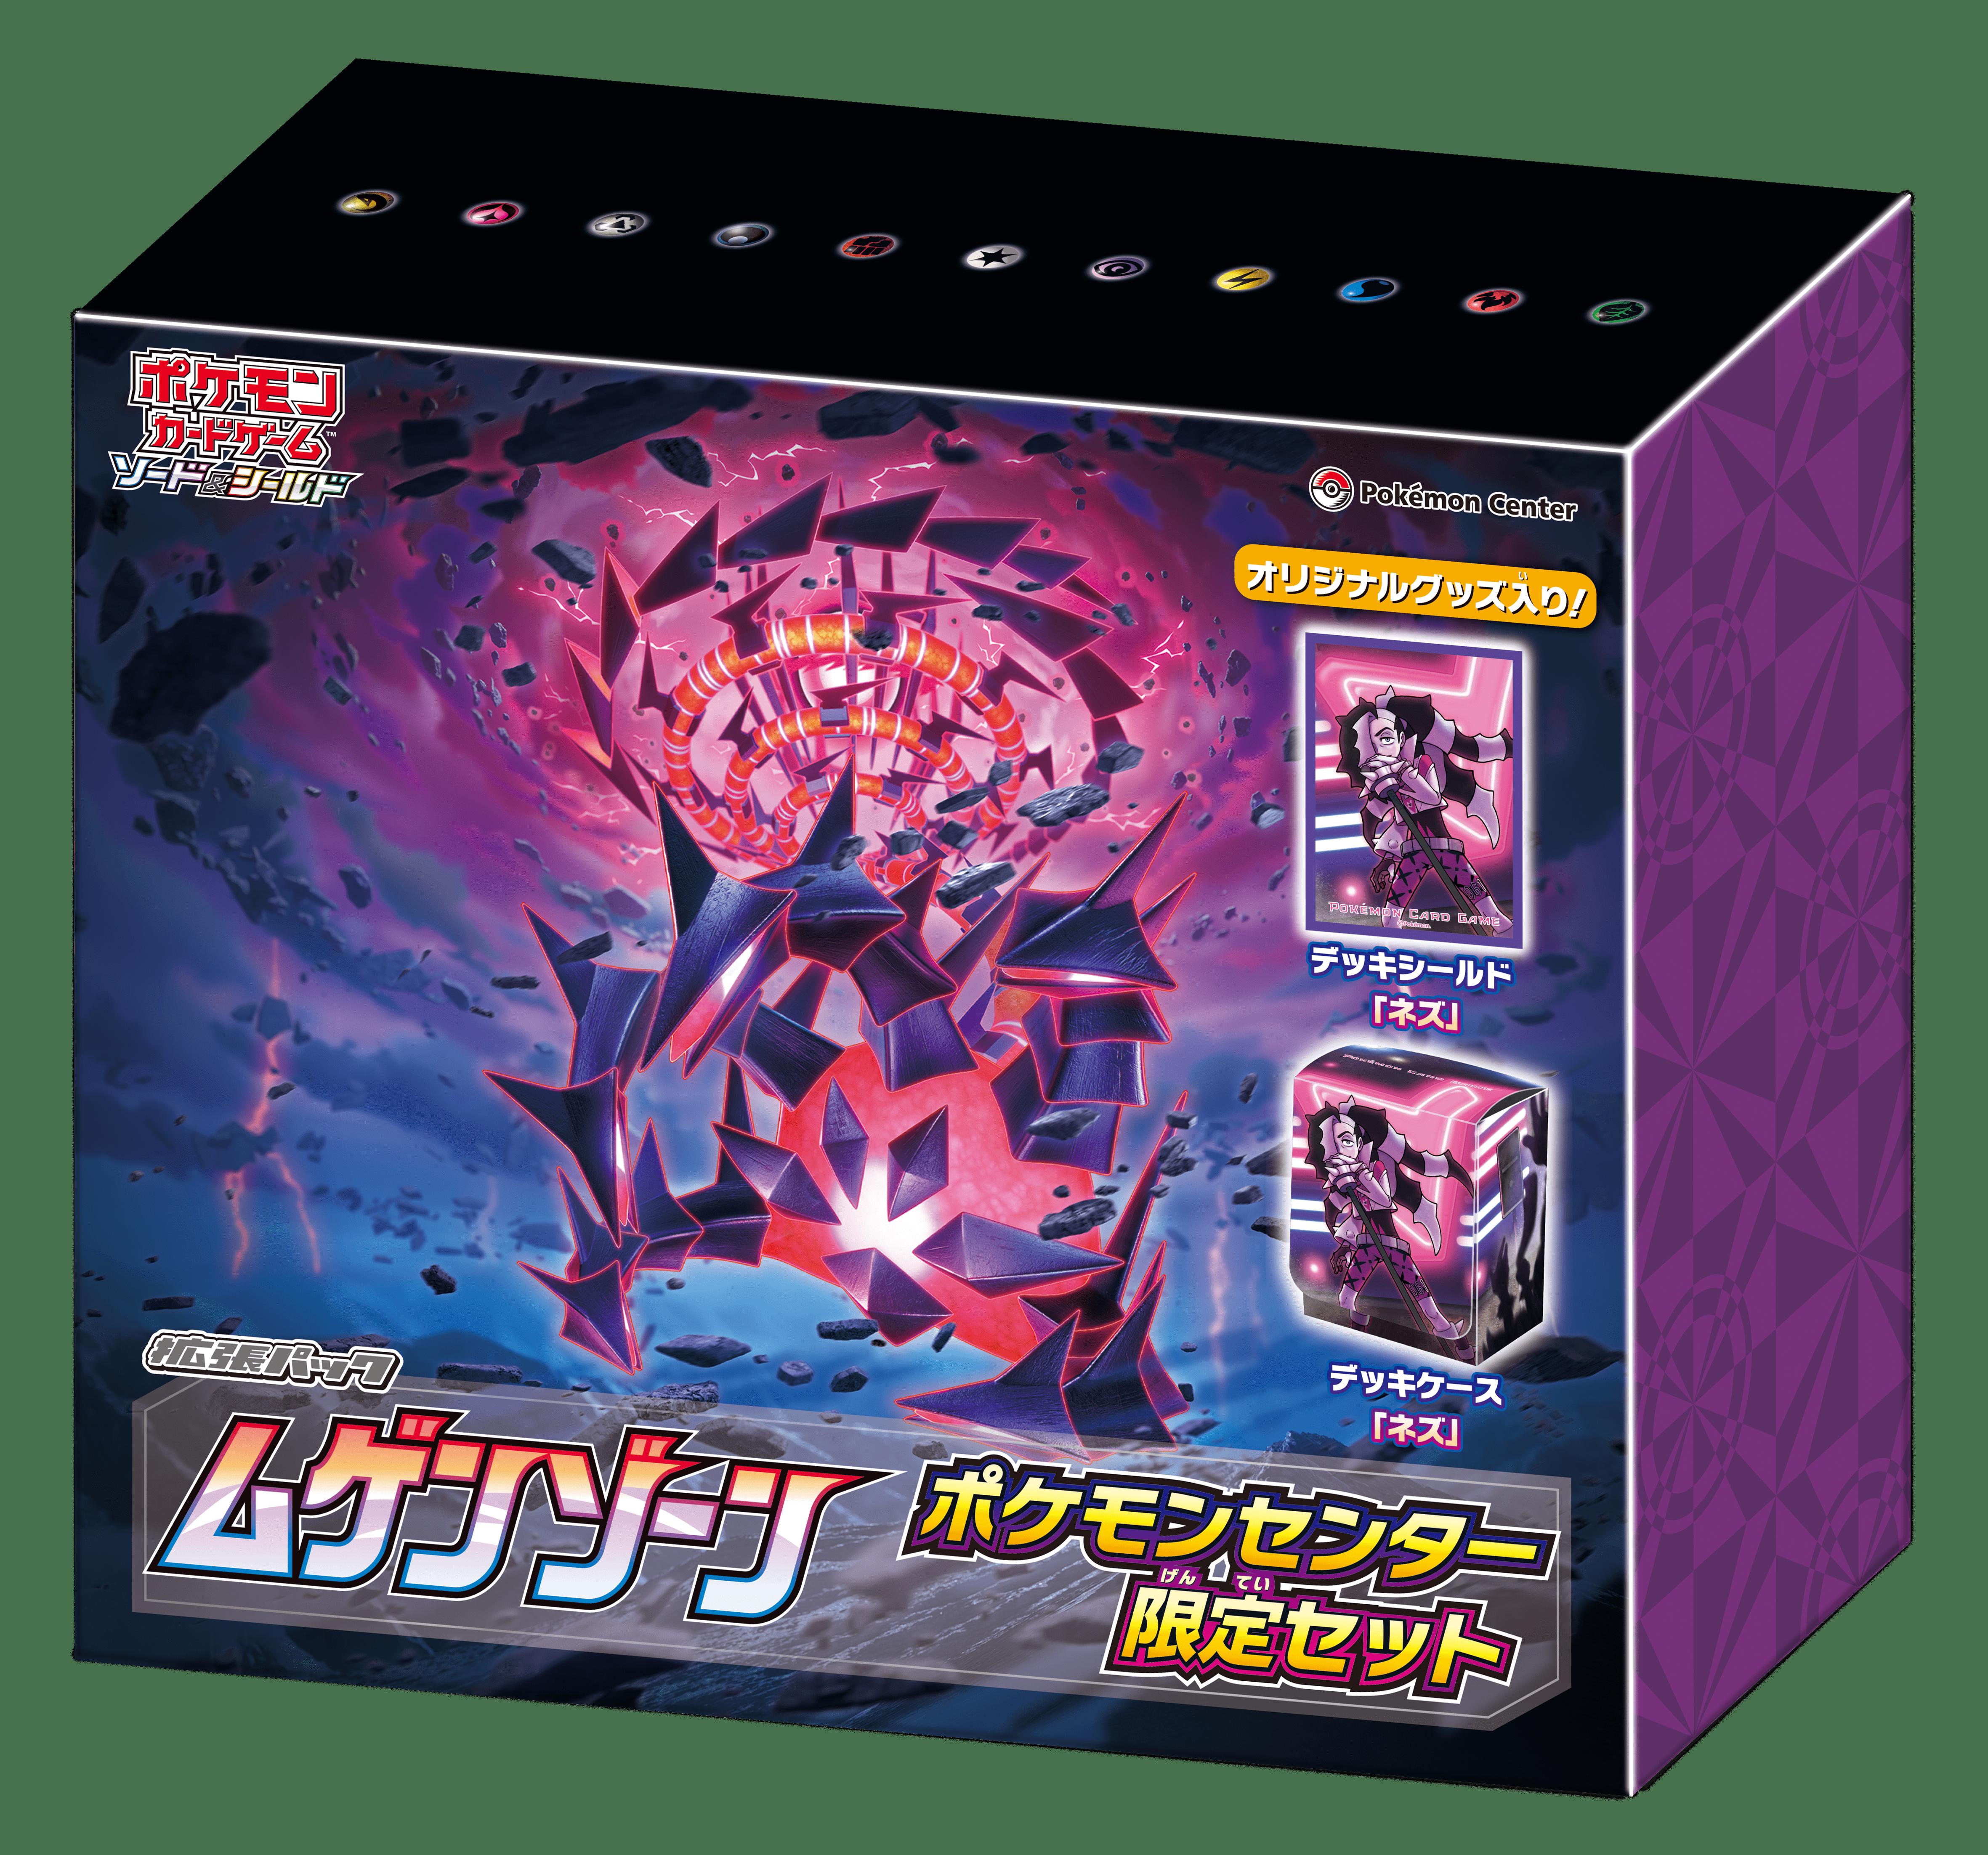 2020 Pokemon TCG Sword & Shield Mugen Zone Pokemon Center Set (Japanese)